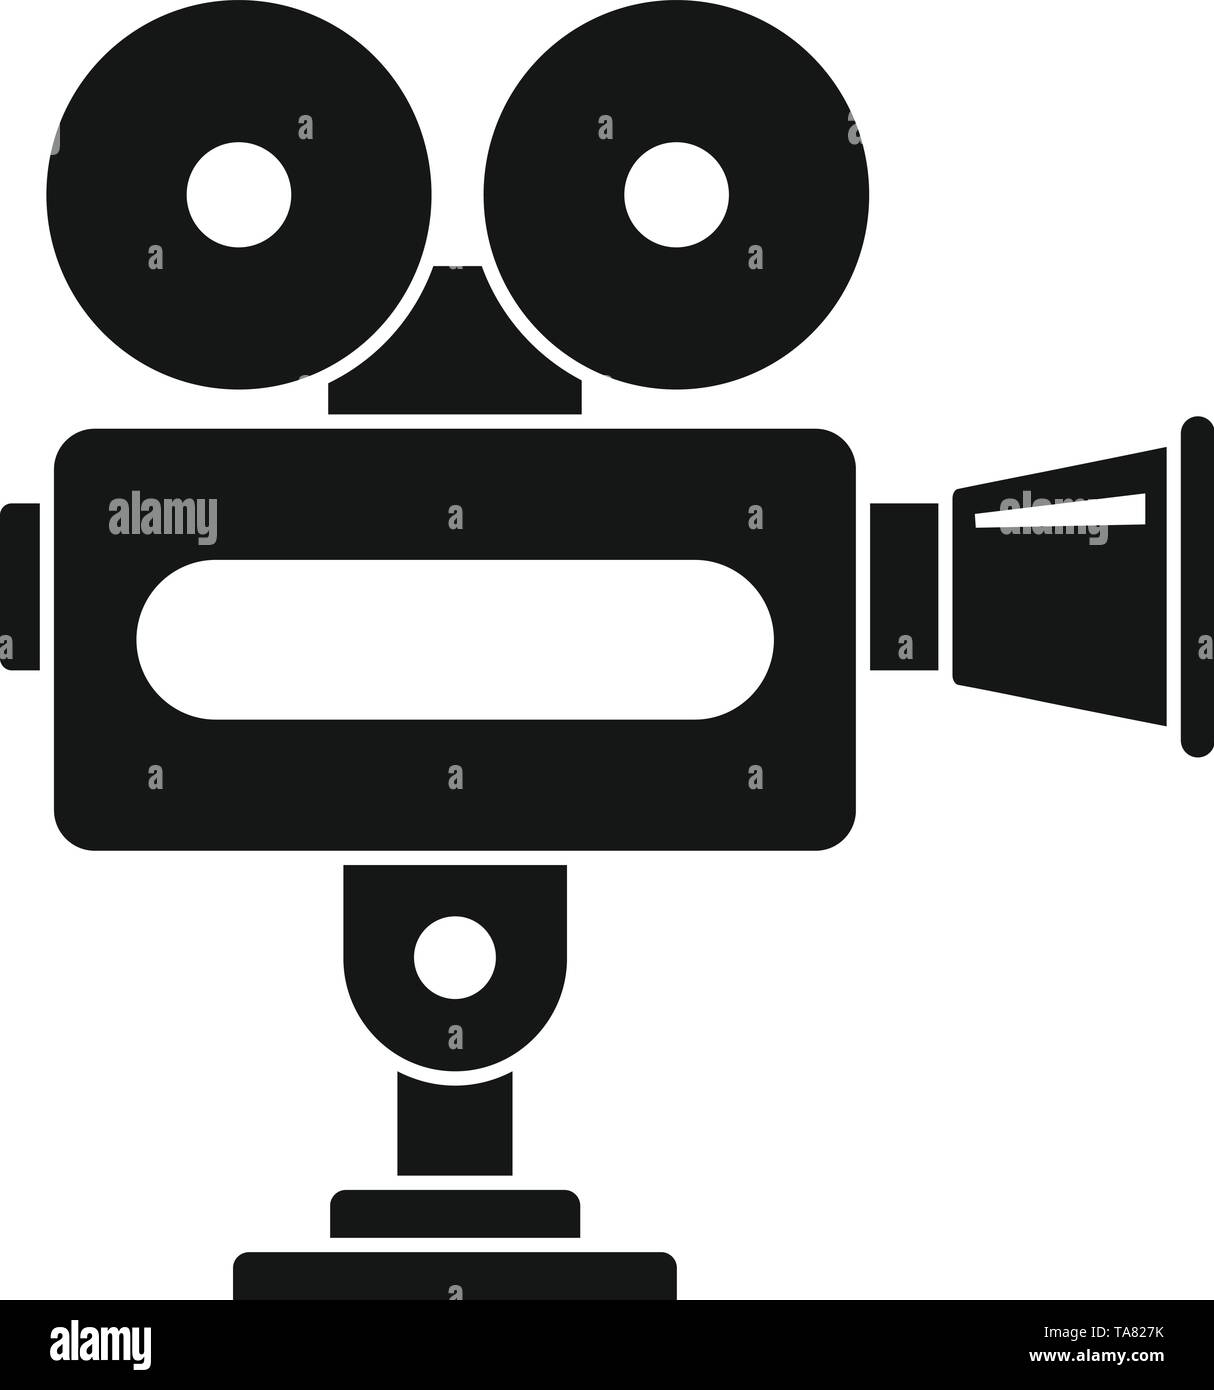 Cinema camera icon. Simple illustration of cinema camera vector icon for web design isolated on white background - Stock Image